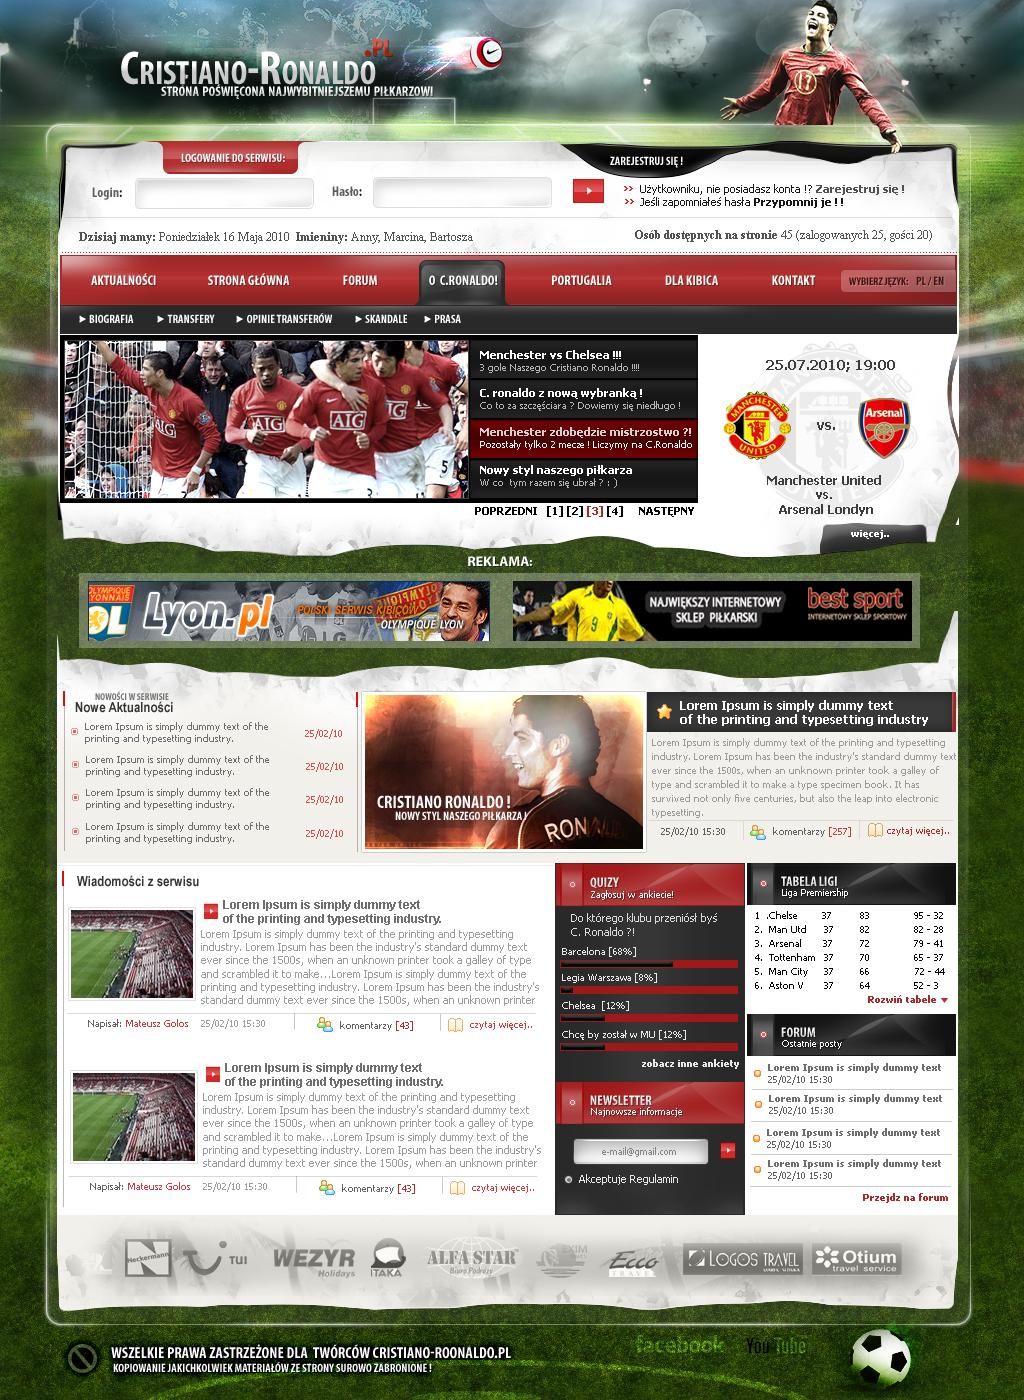 cristiano ronaldo site by lukearoo